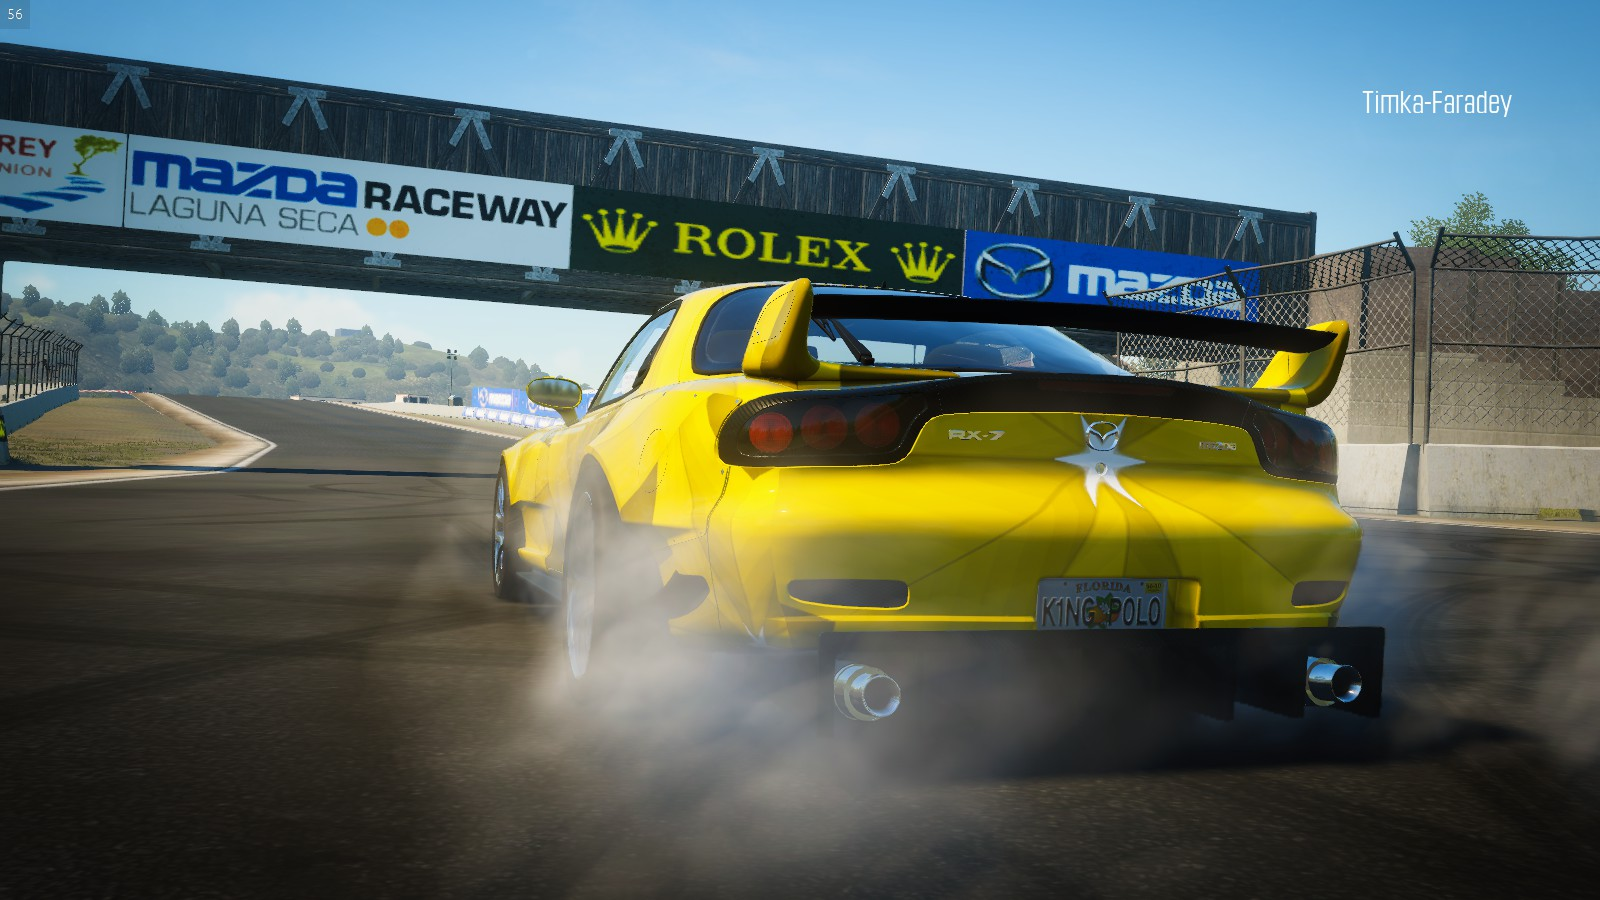 Mazda RX-7 - Crew, the Mazda, RX-7, Автомобиль, Транспорт